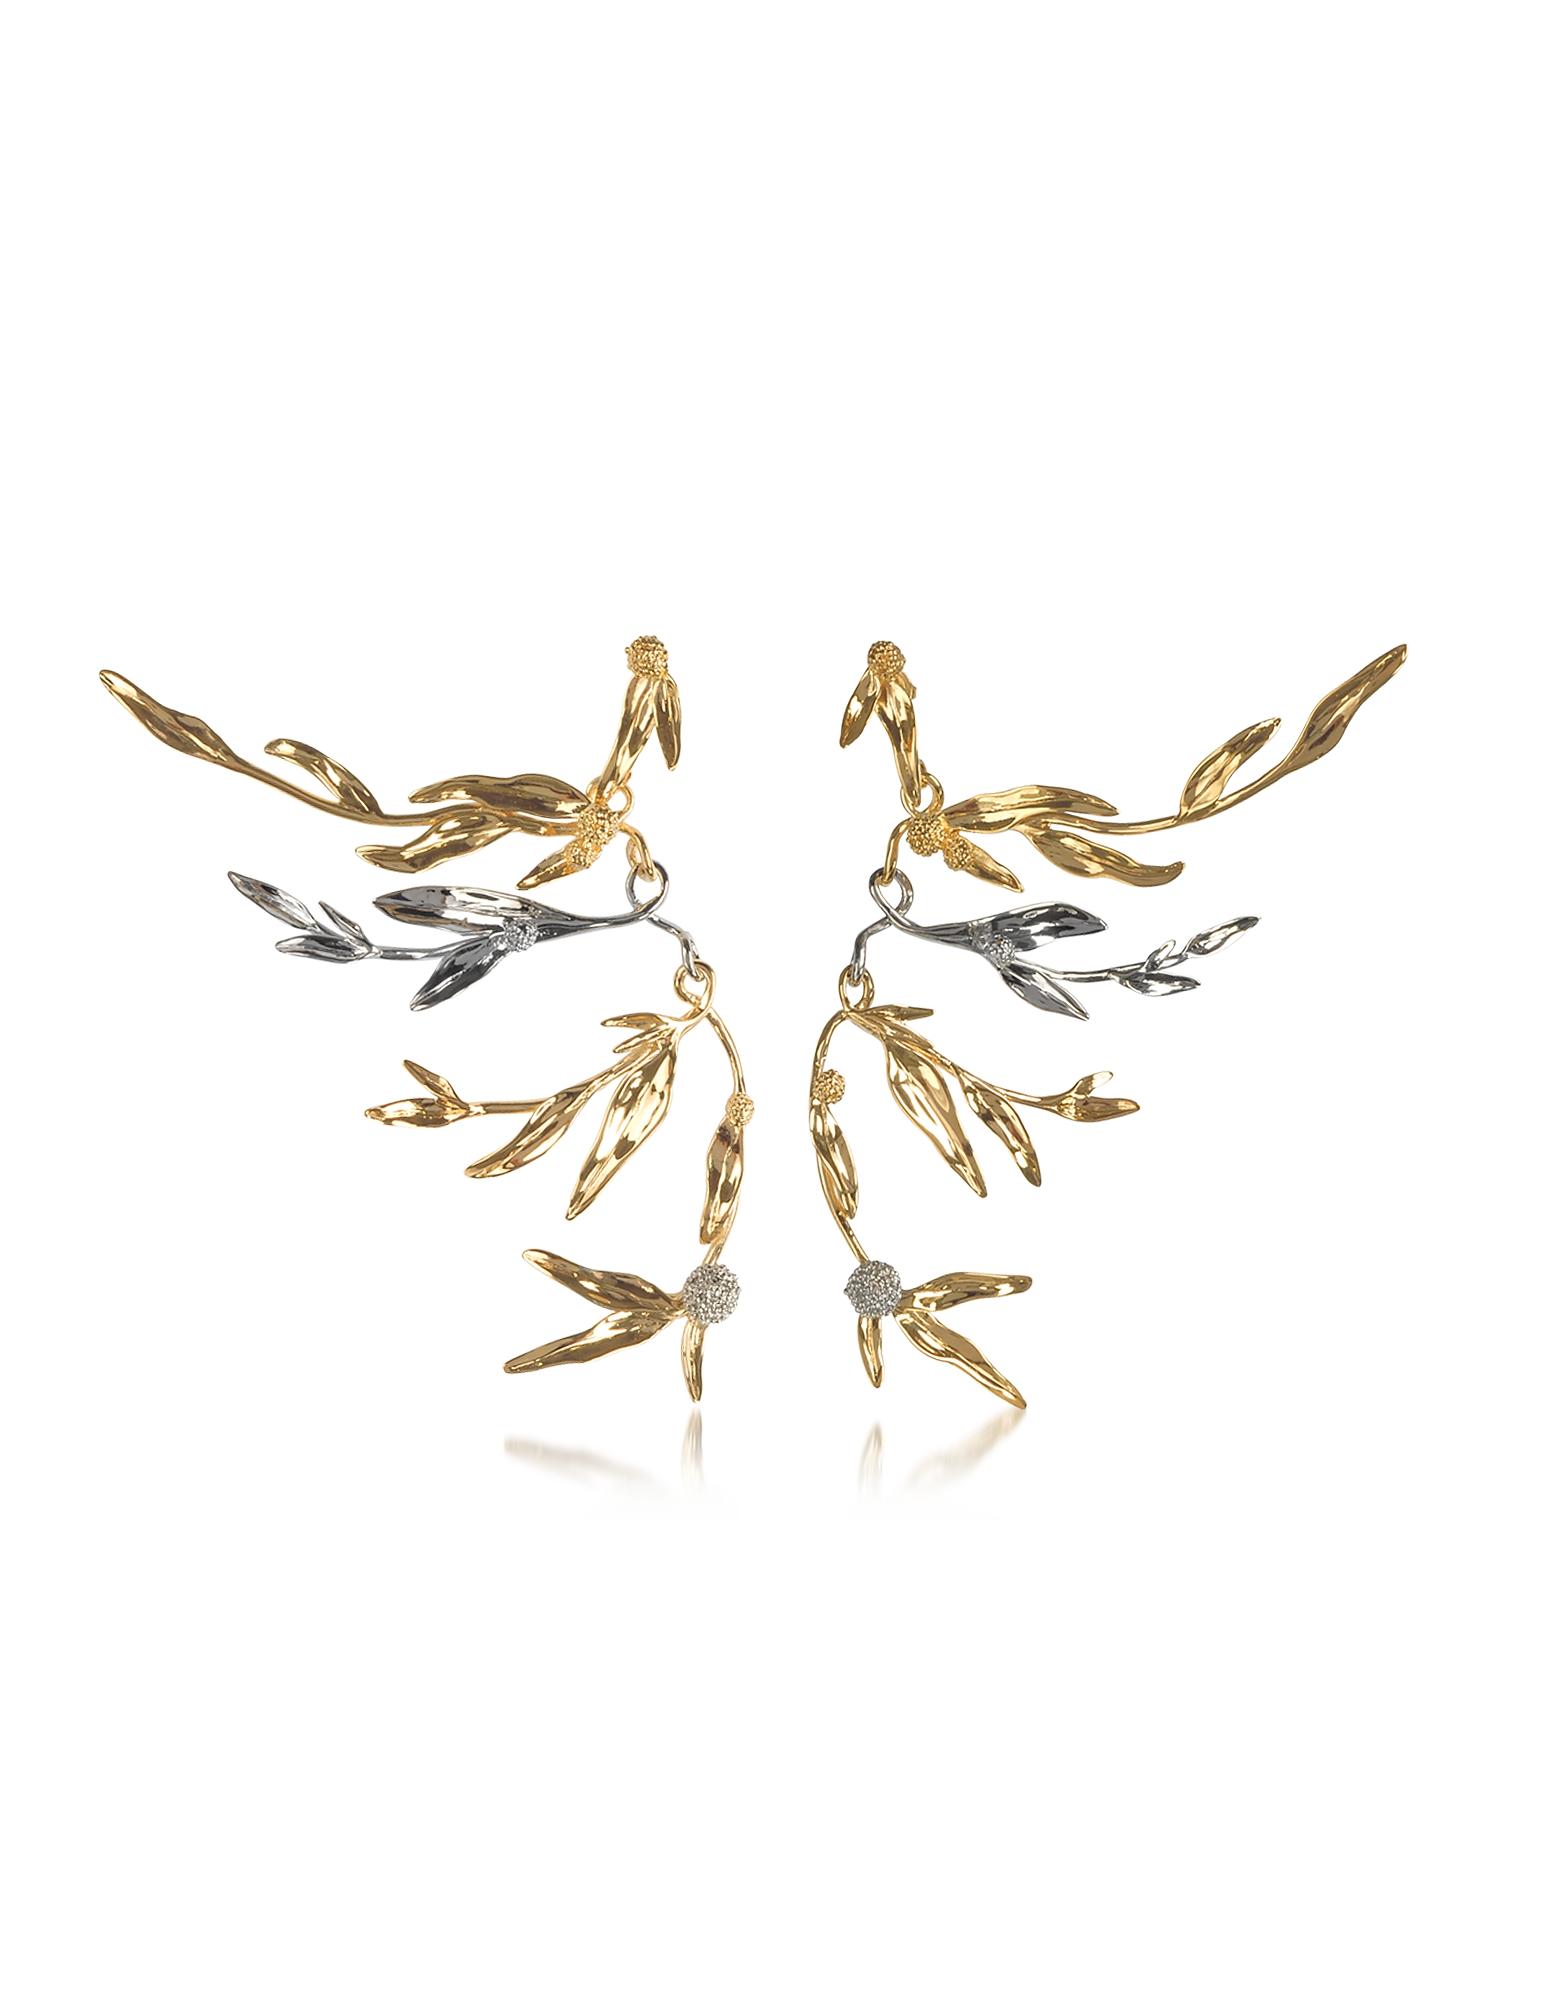 Image of Aurelie Bidermann Designer Earrings, 18K gold-plated Brass Mimosa Articulated Earrings